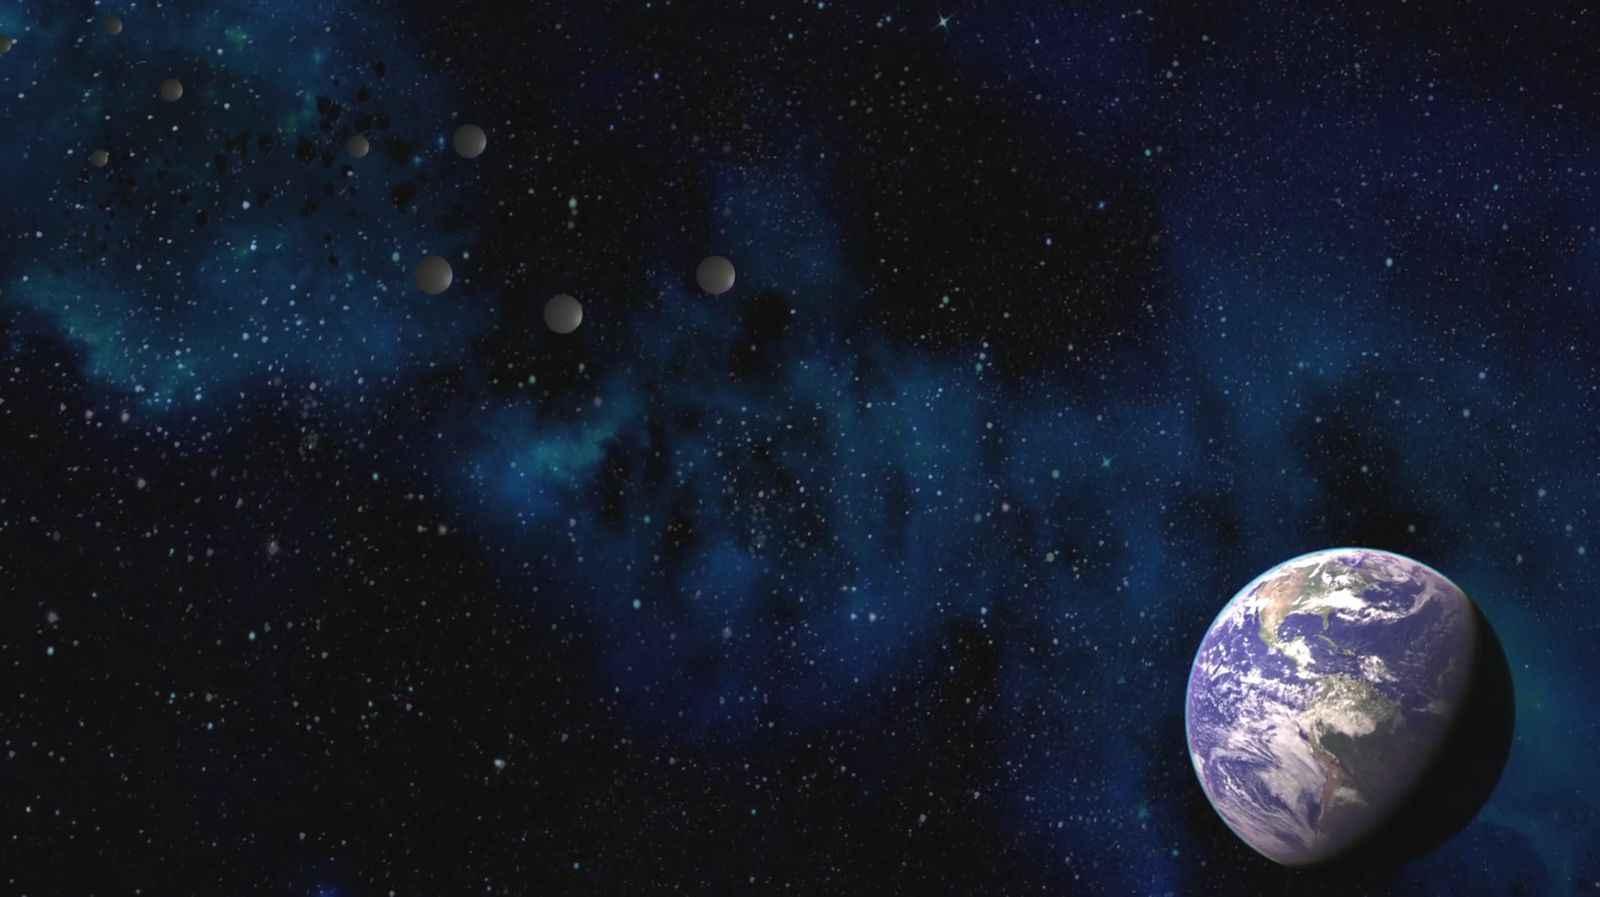 6_earth_and_metallic_spheres.jpg